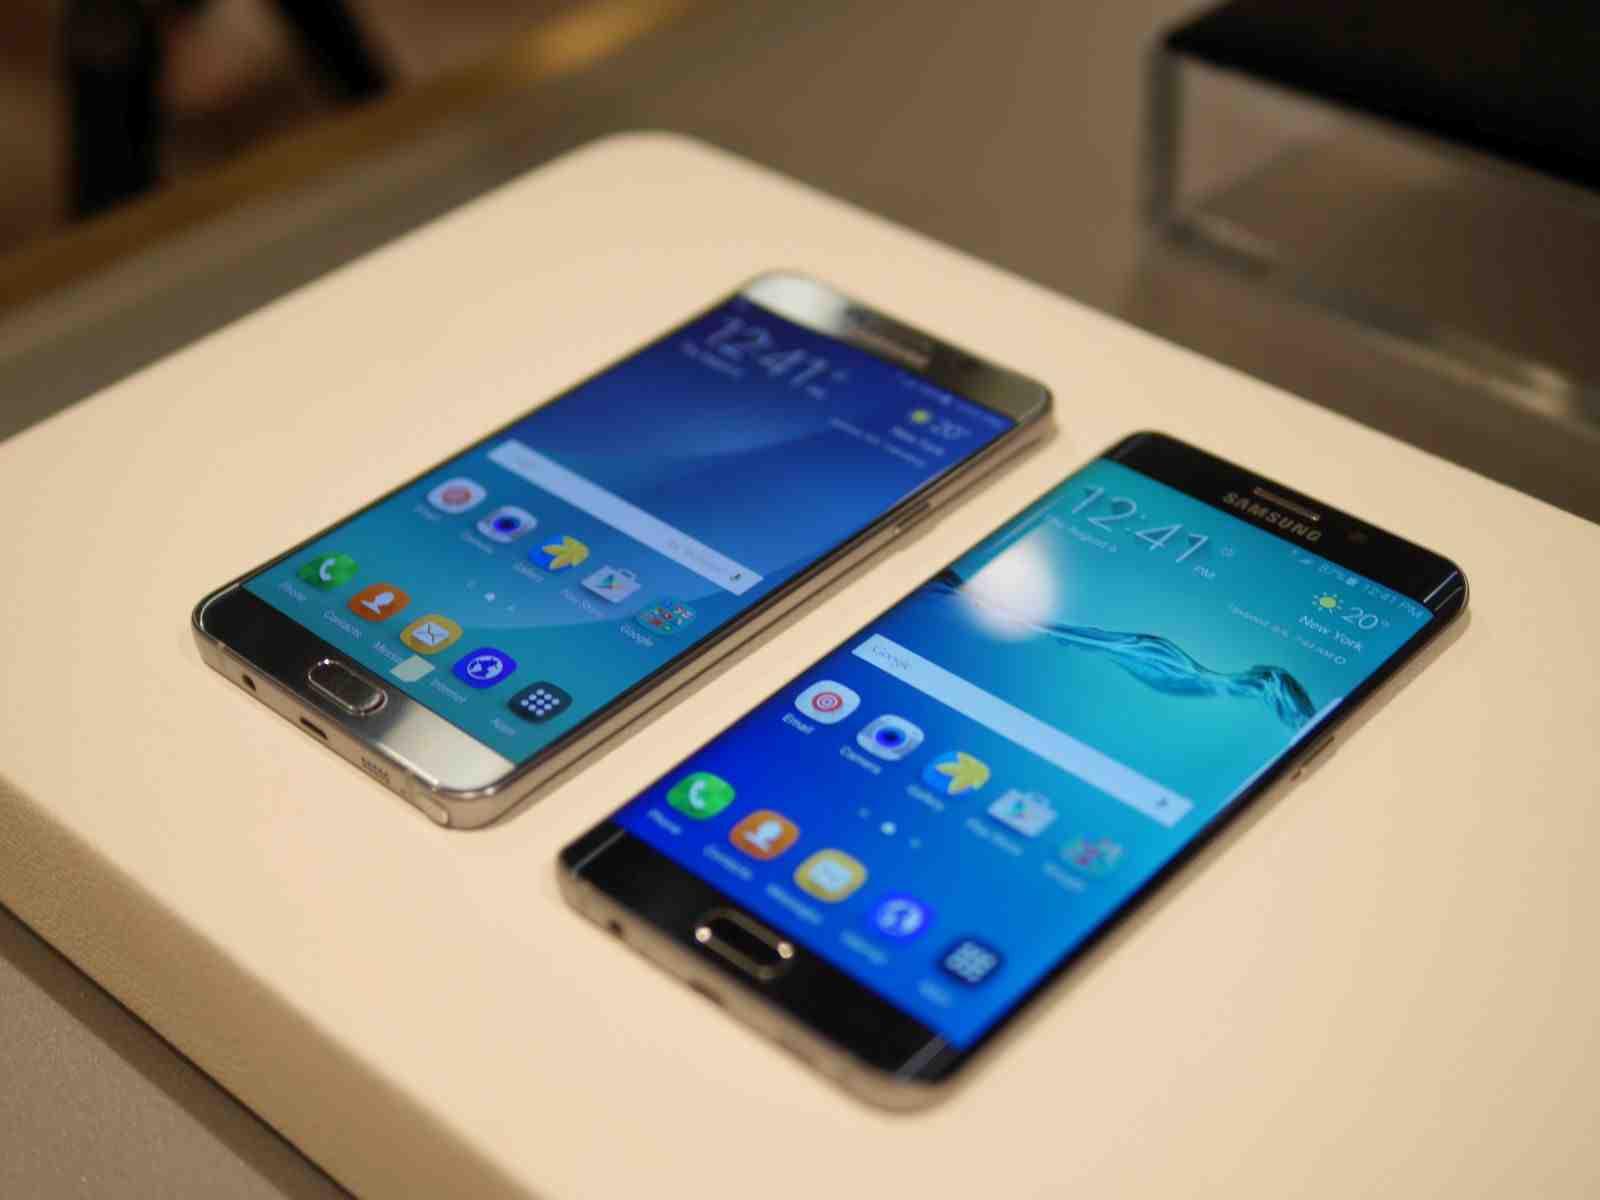 Samsung Galaxy Note 5: Hands-on